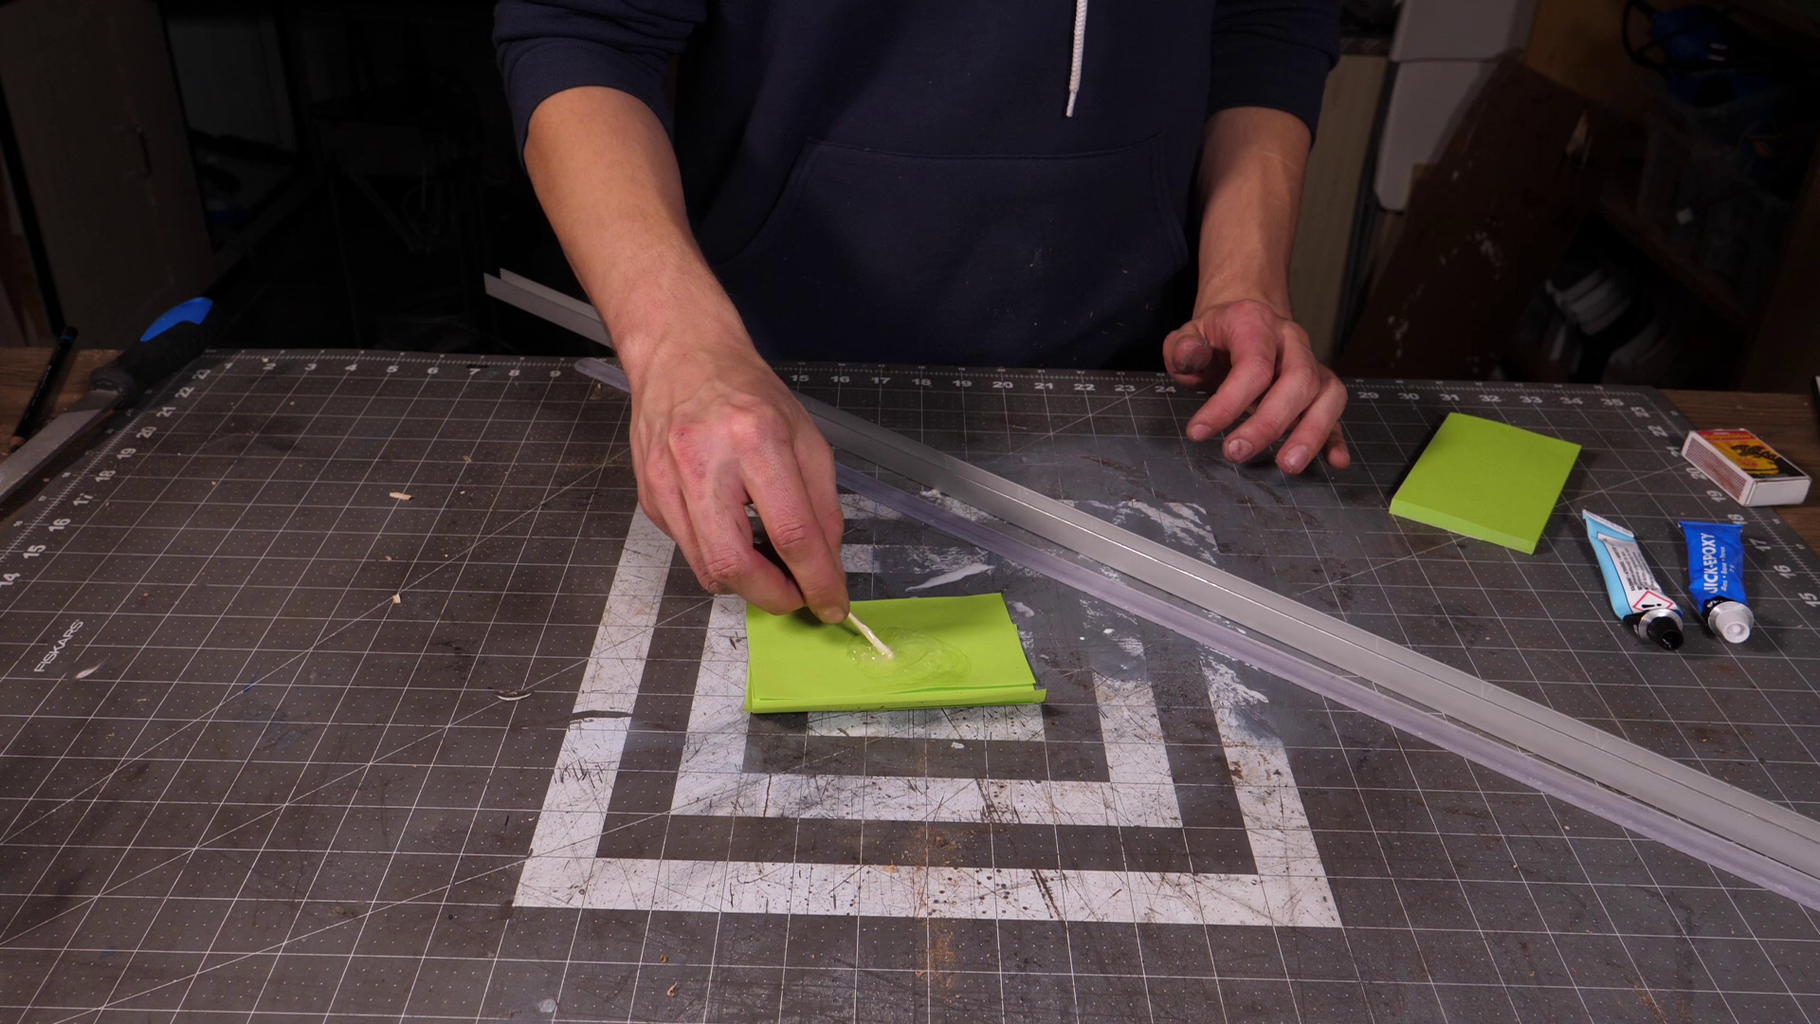 Fastening the Acrylic Light Diffuser